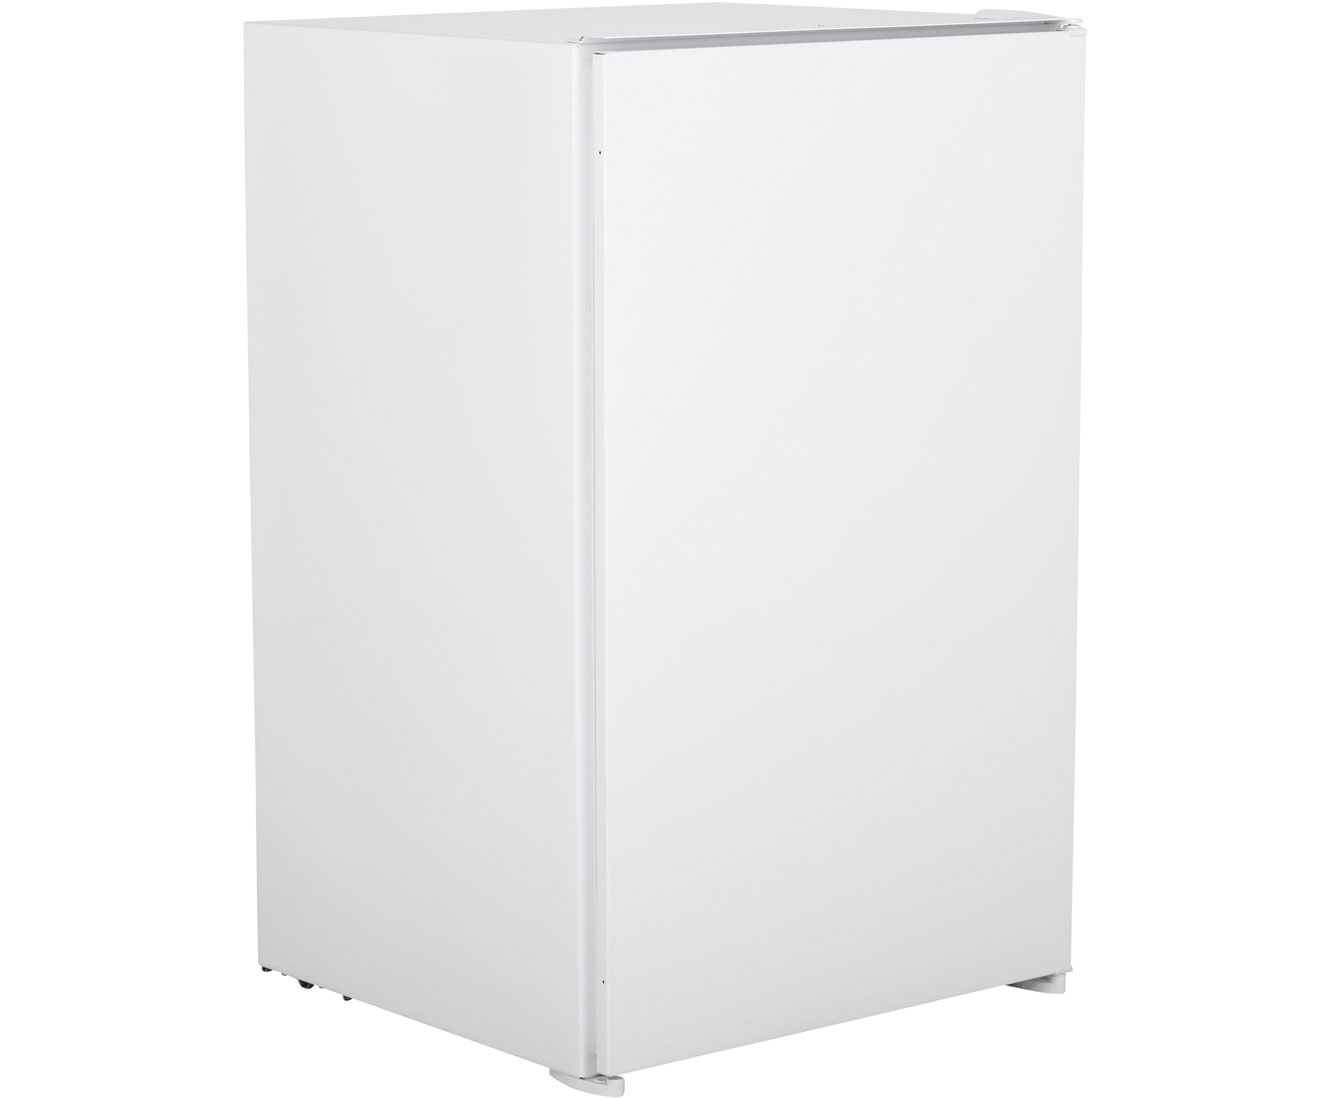 Aeg Kühlschrank Integrierbar 122 Cm : Rabatt preisvergleich.de kühlen & gefrieren u003e kühlschränke